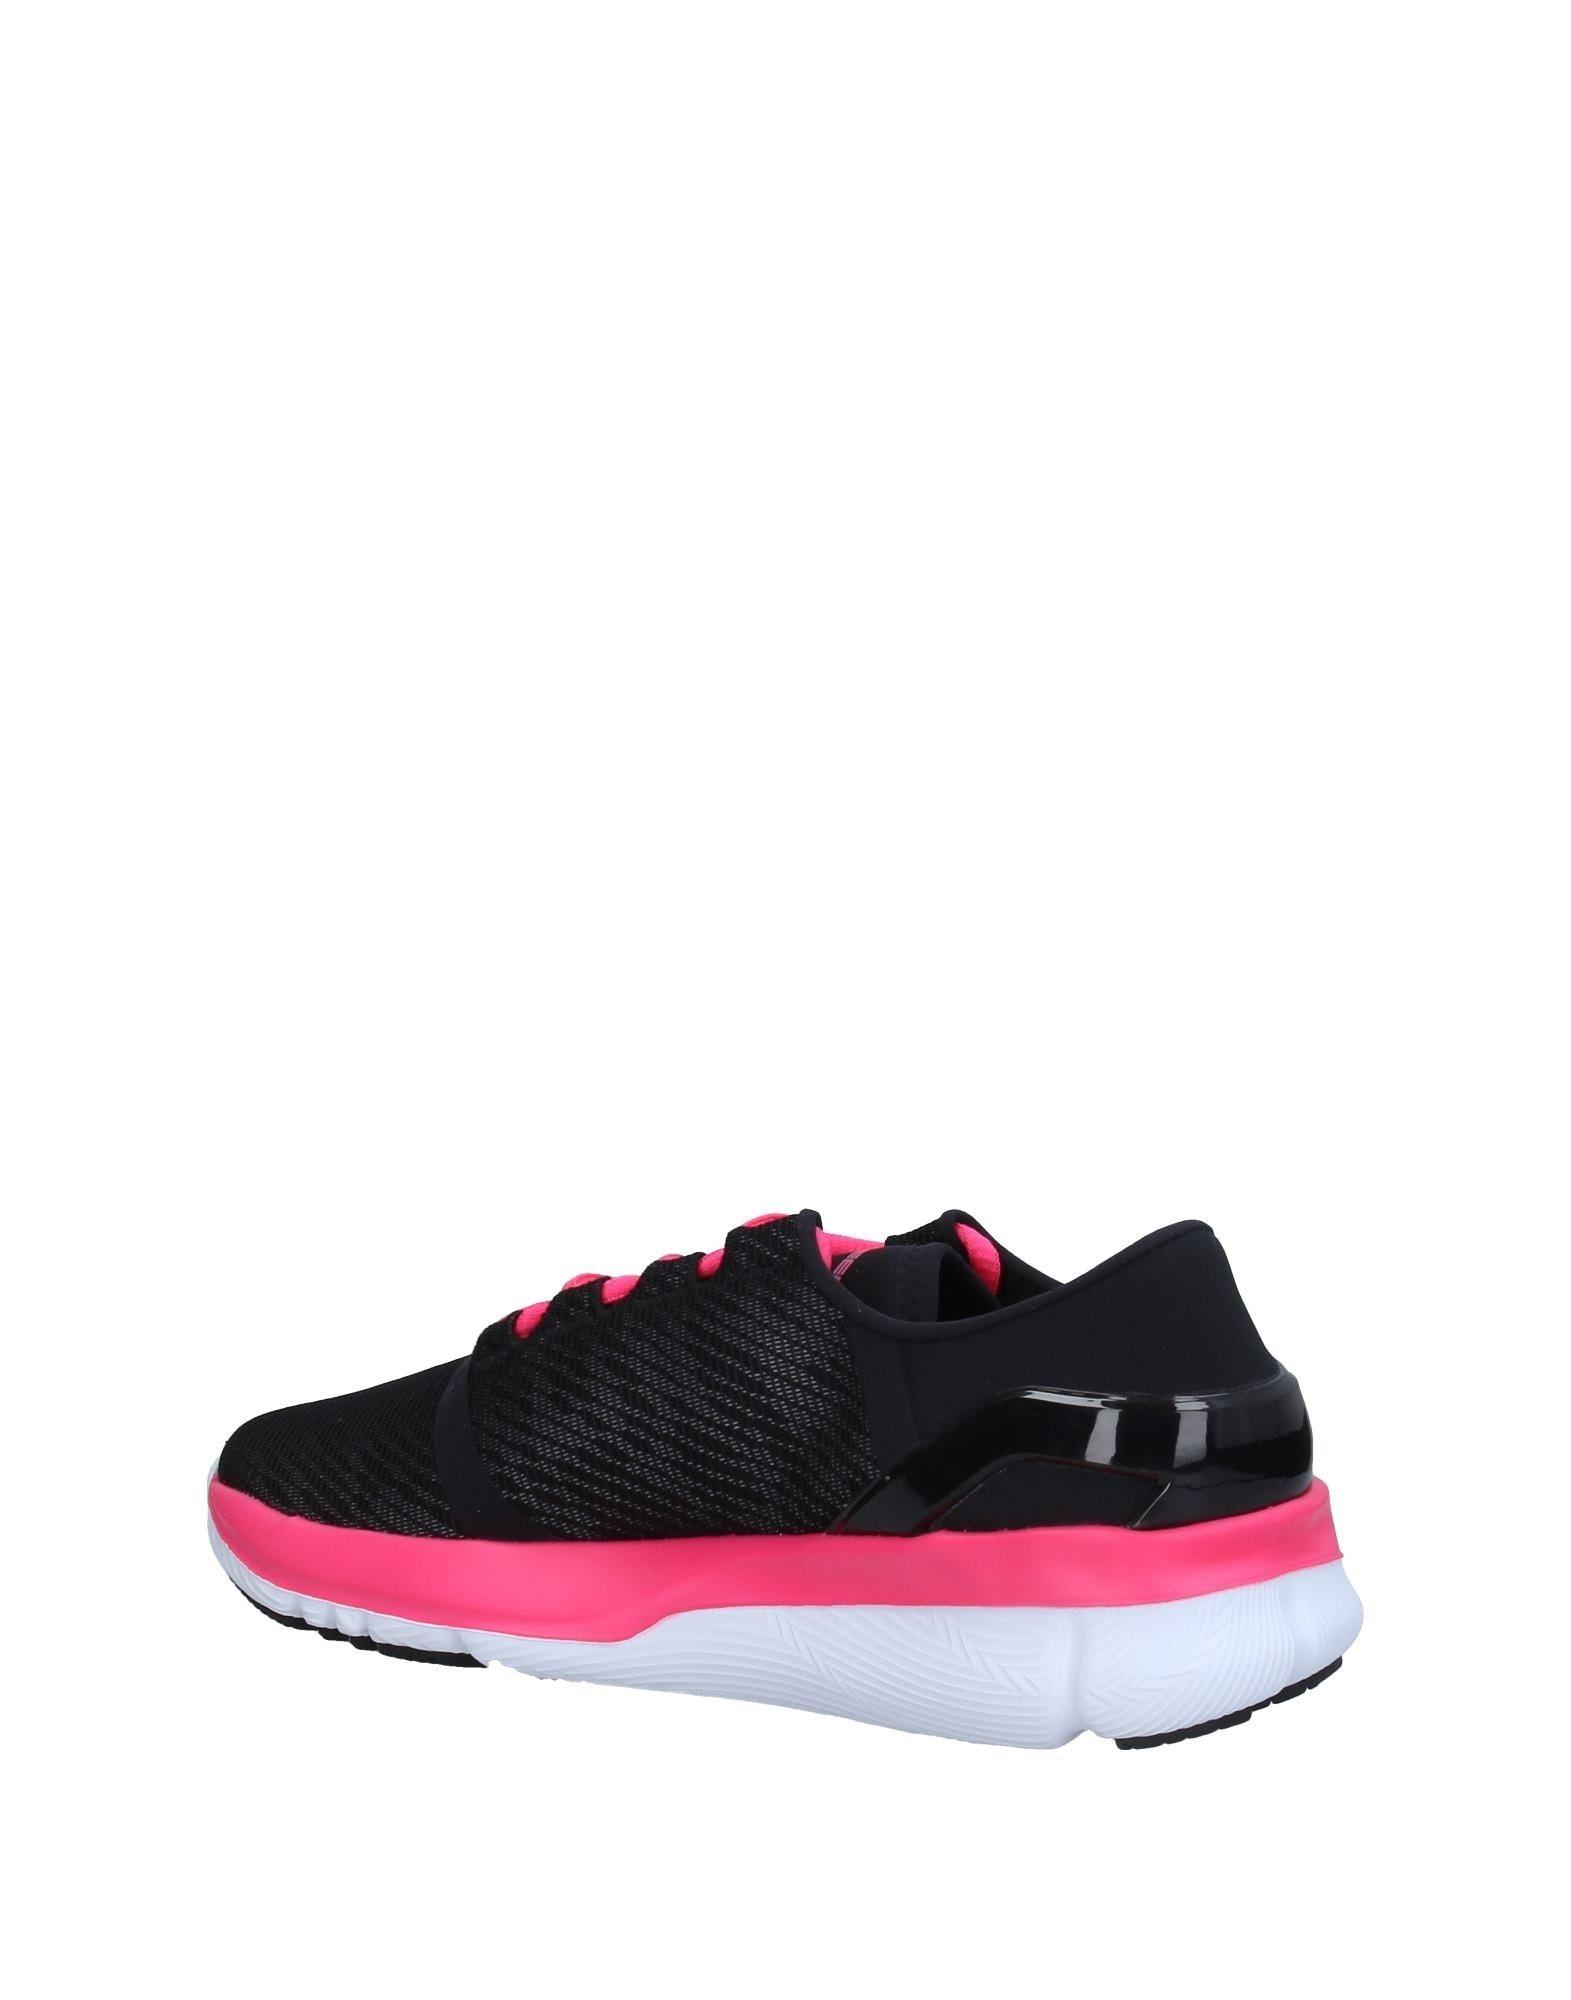 Under Damen Armour Sneakers Damen Under  11261230RK 8da1e5